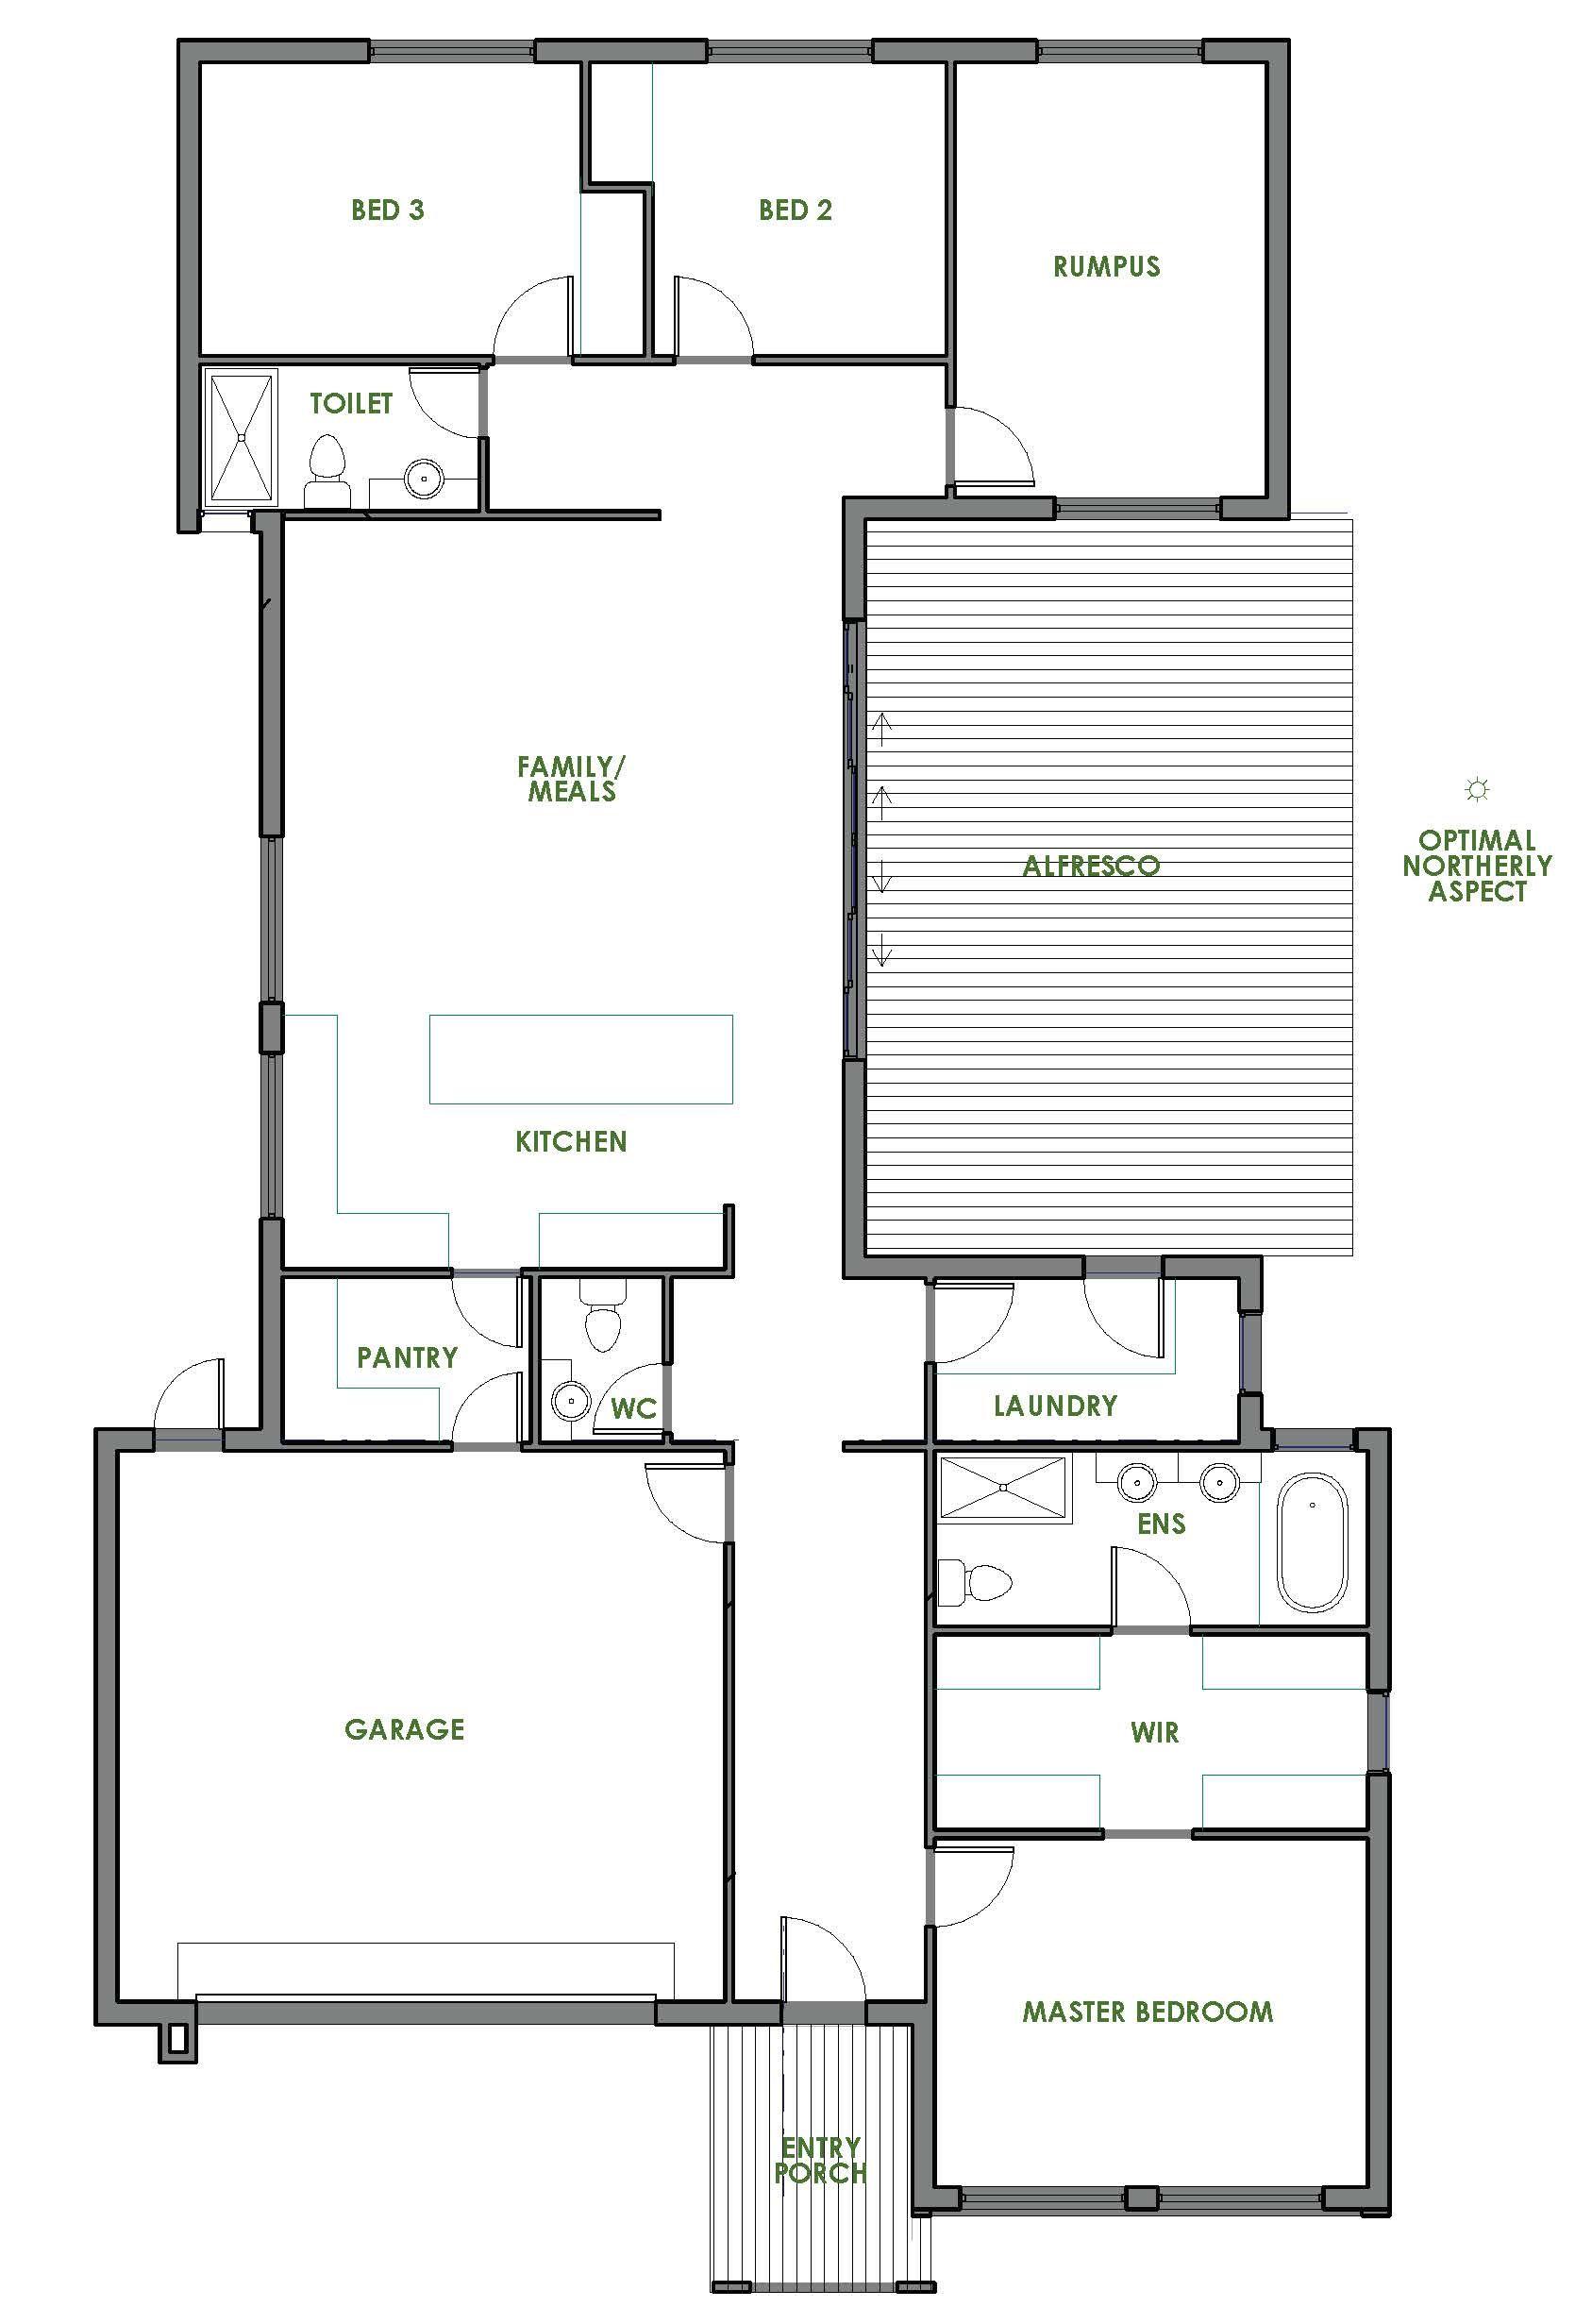 aberdeen - energy efficient home design - green homes australia